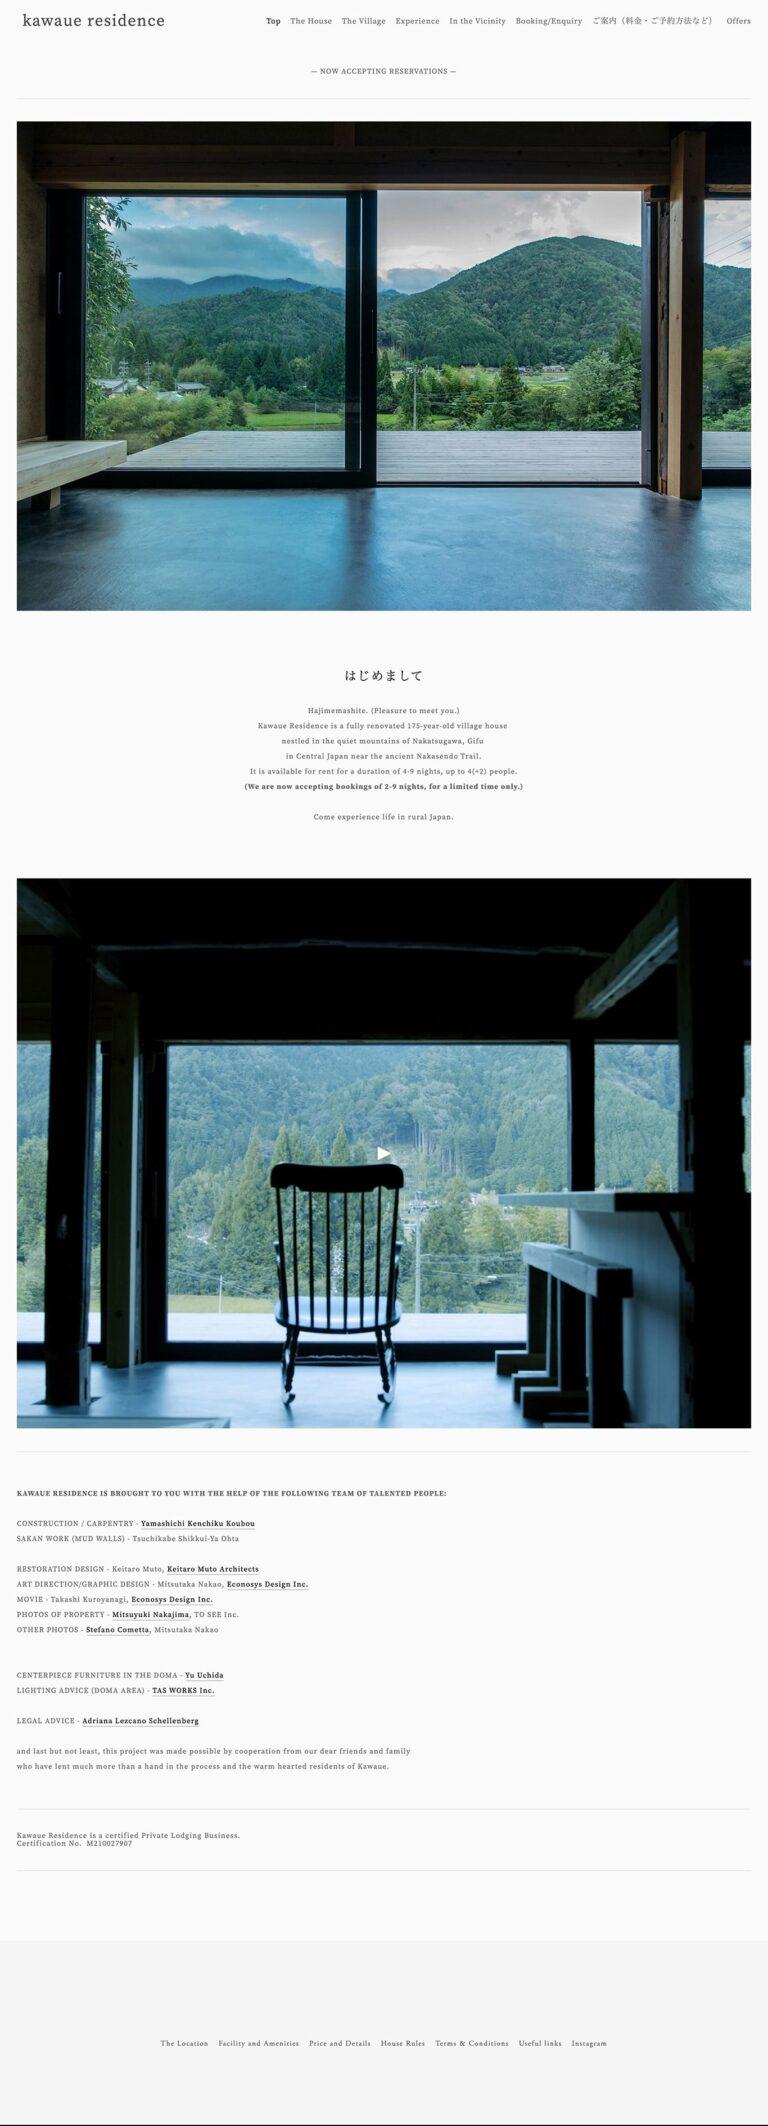 kawaue residence